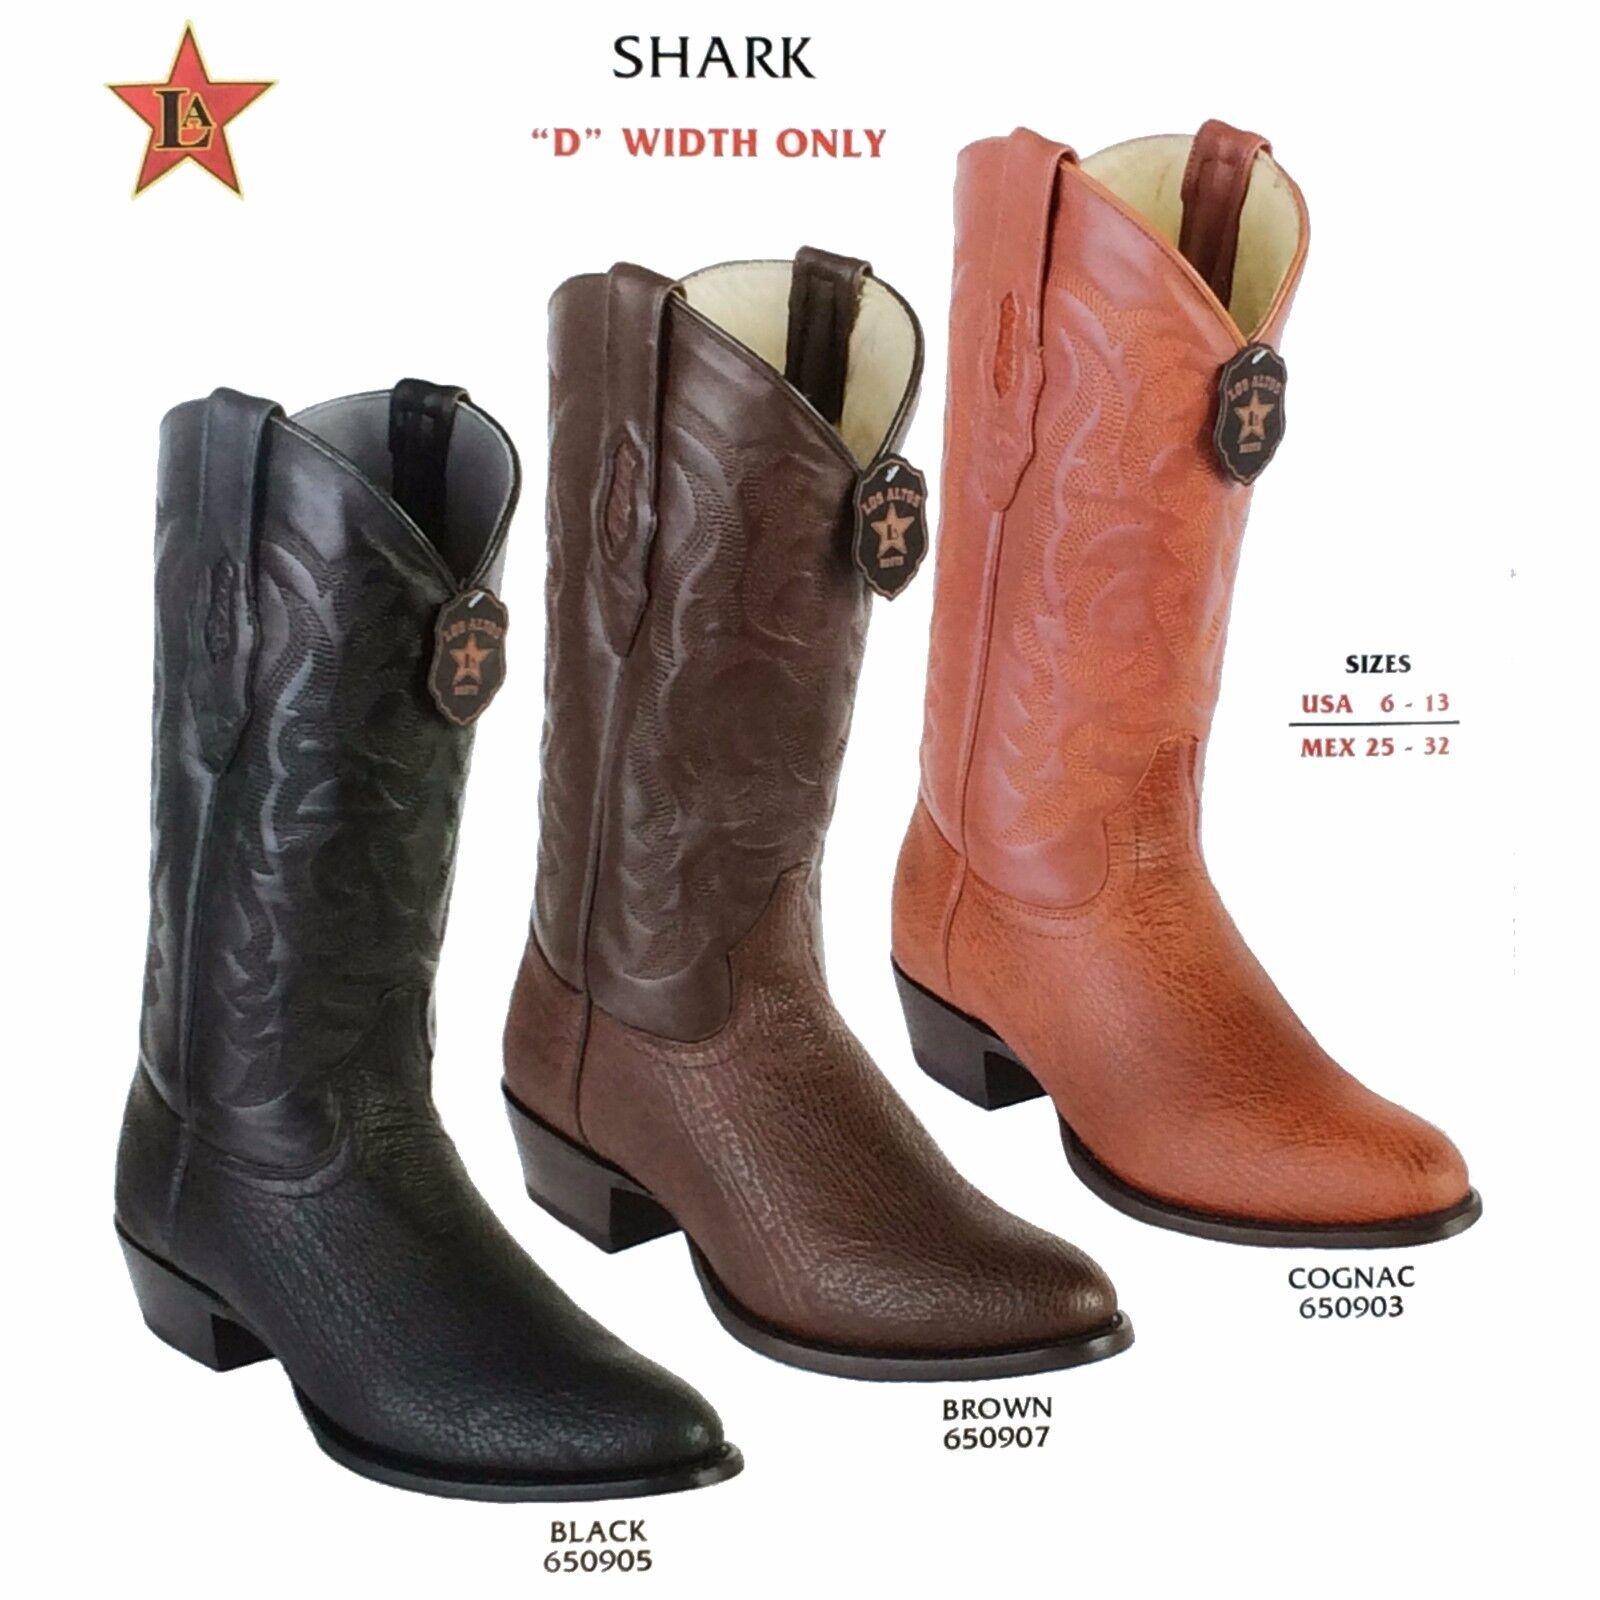 Los Altos, Western Men's Boots, Shark, H-65 Round Toe, Cowboy Boots